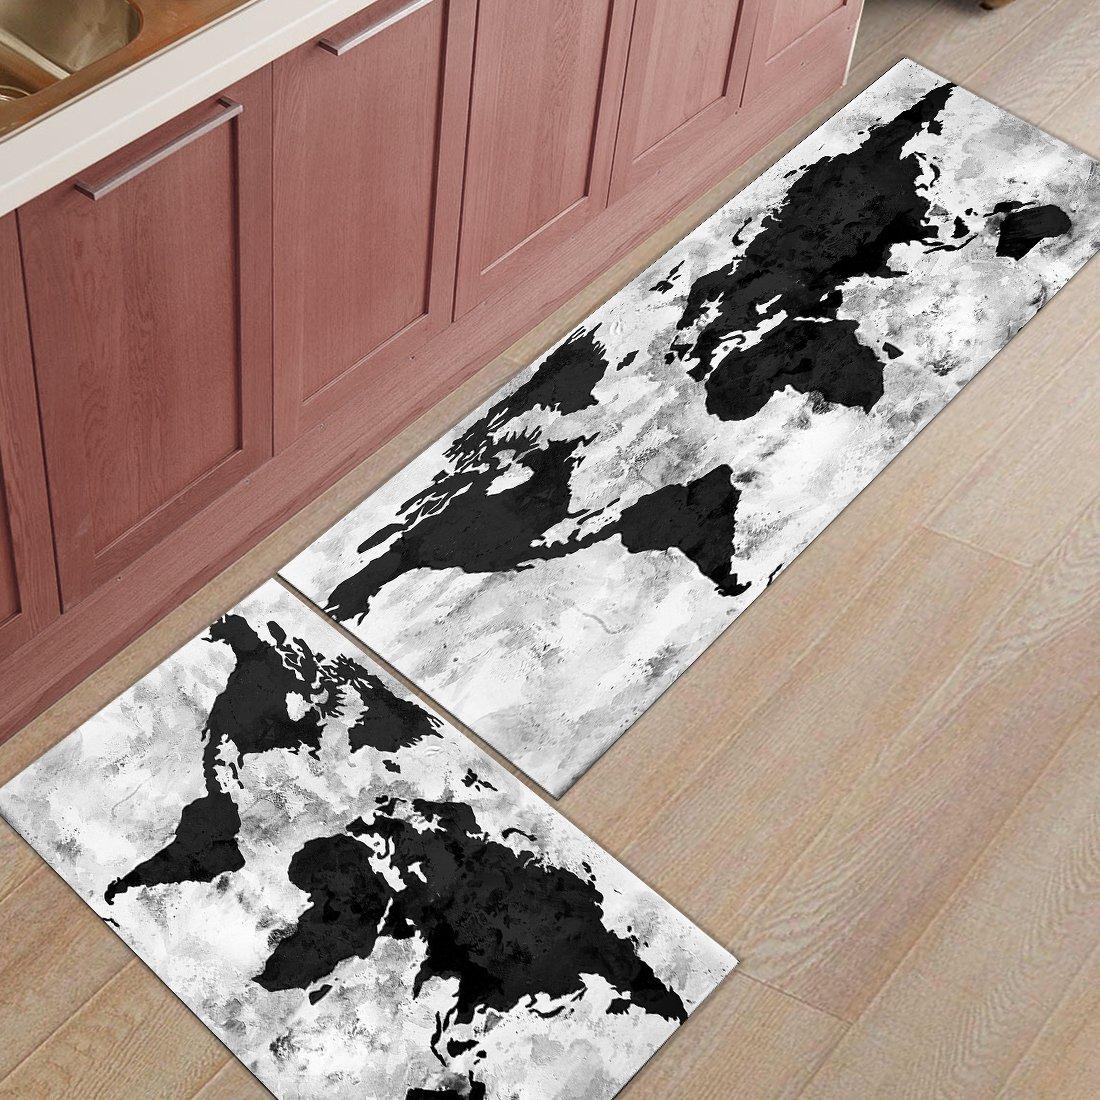 Infinidesign 2 Piece Kitchen Rubber Backing Non-Slip Bath Rugs Runner Doormat Set - Retro Monochrome Wood Grain World Map Runner Carpet Set - 23.6''x35.4''+23.6''x70.9''